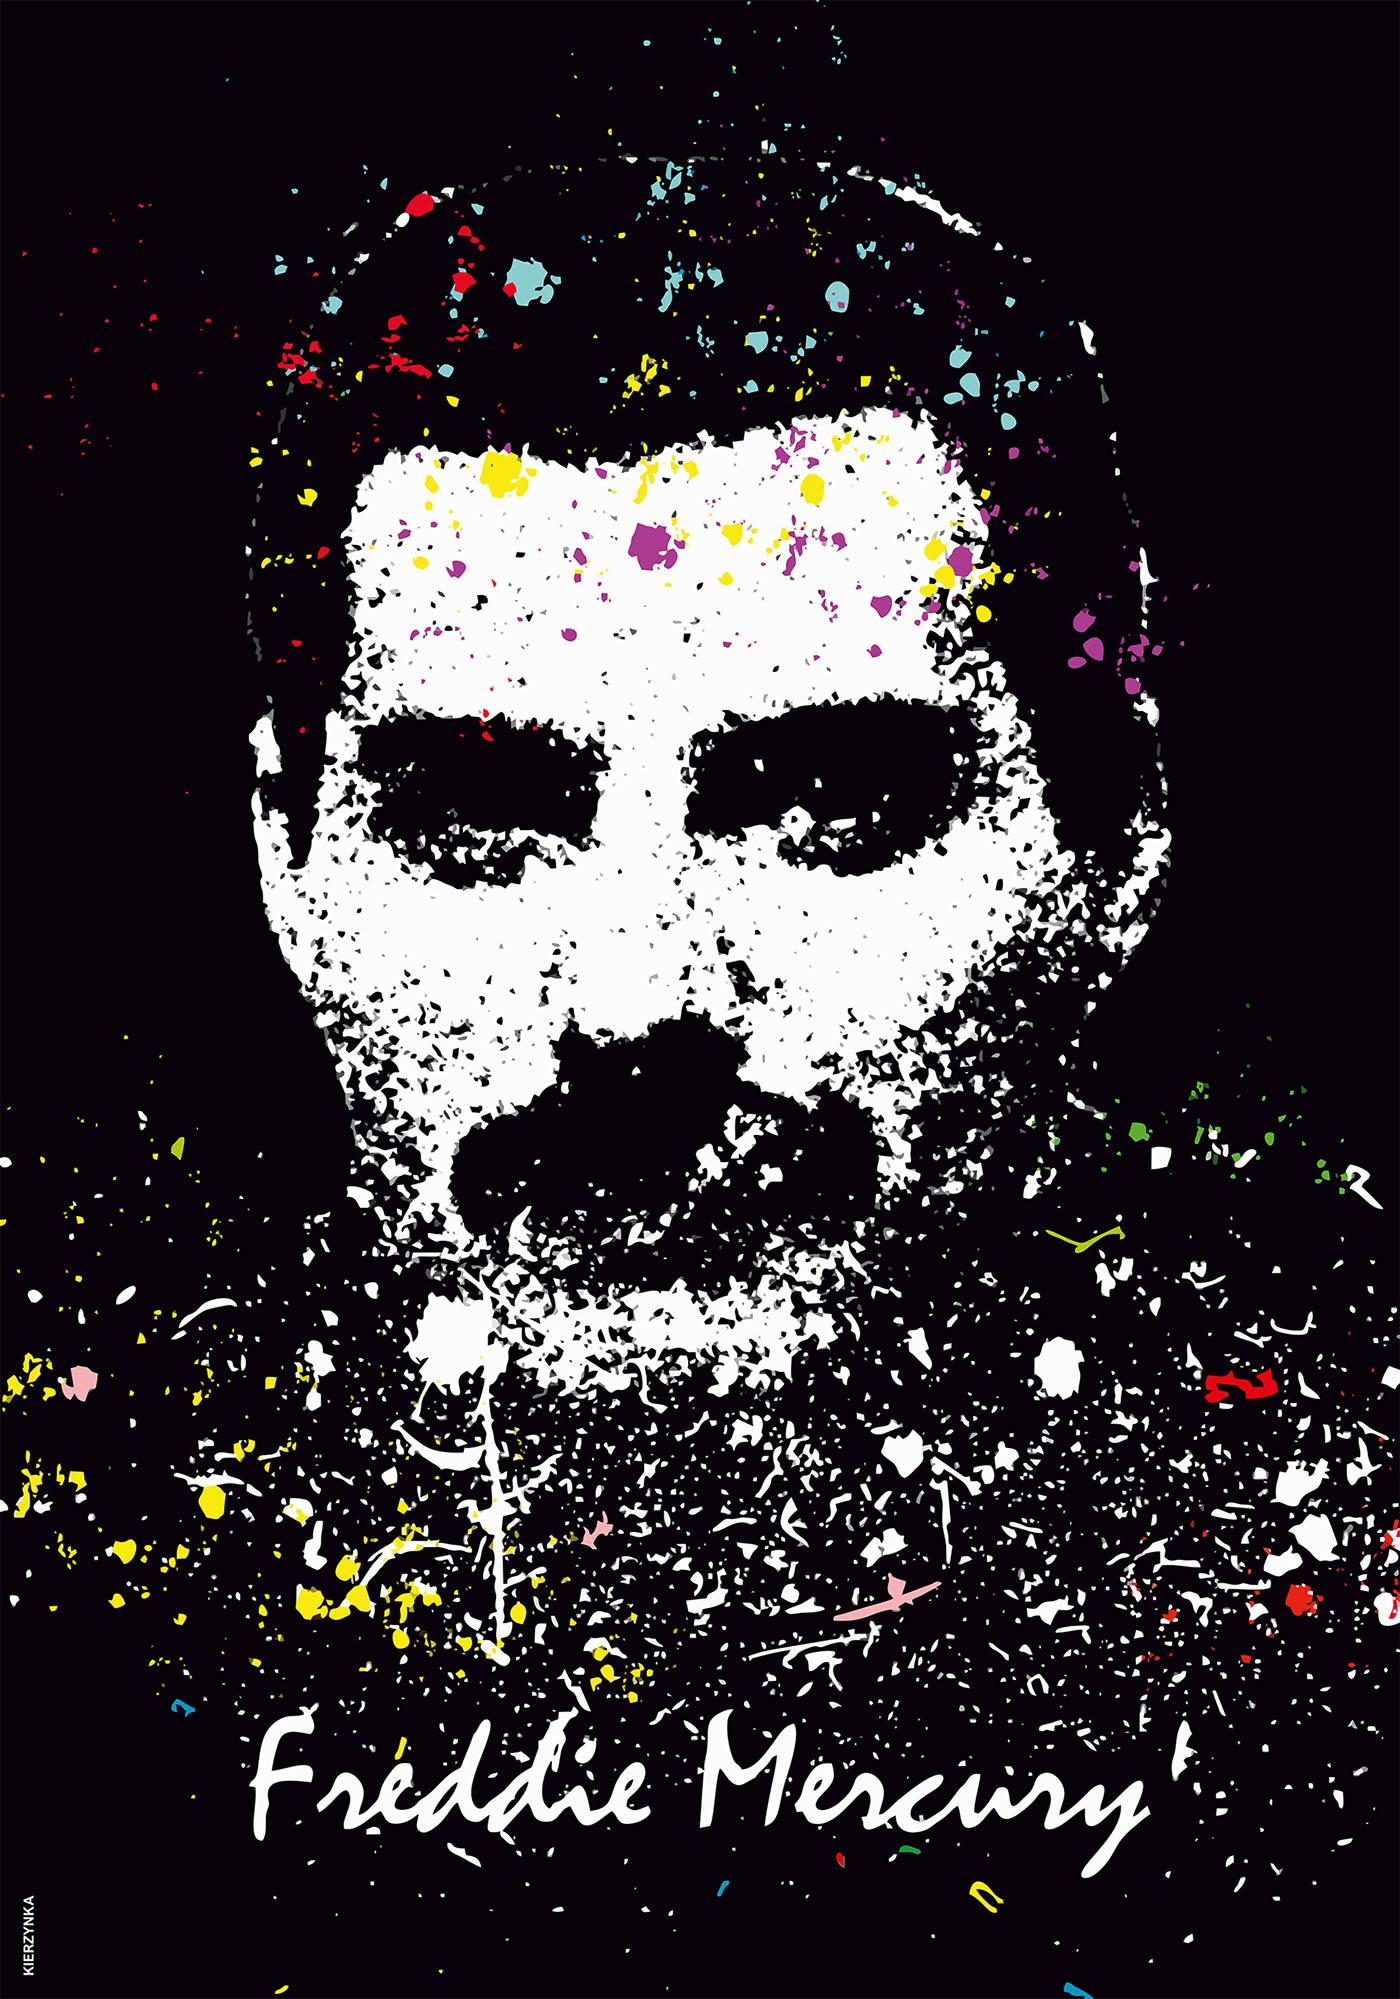 Freddie Mercury, 2020